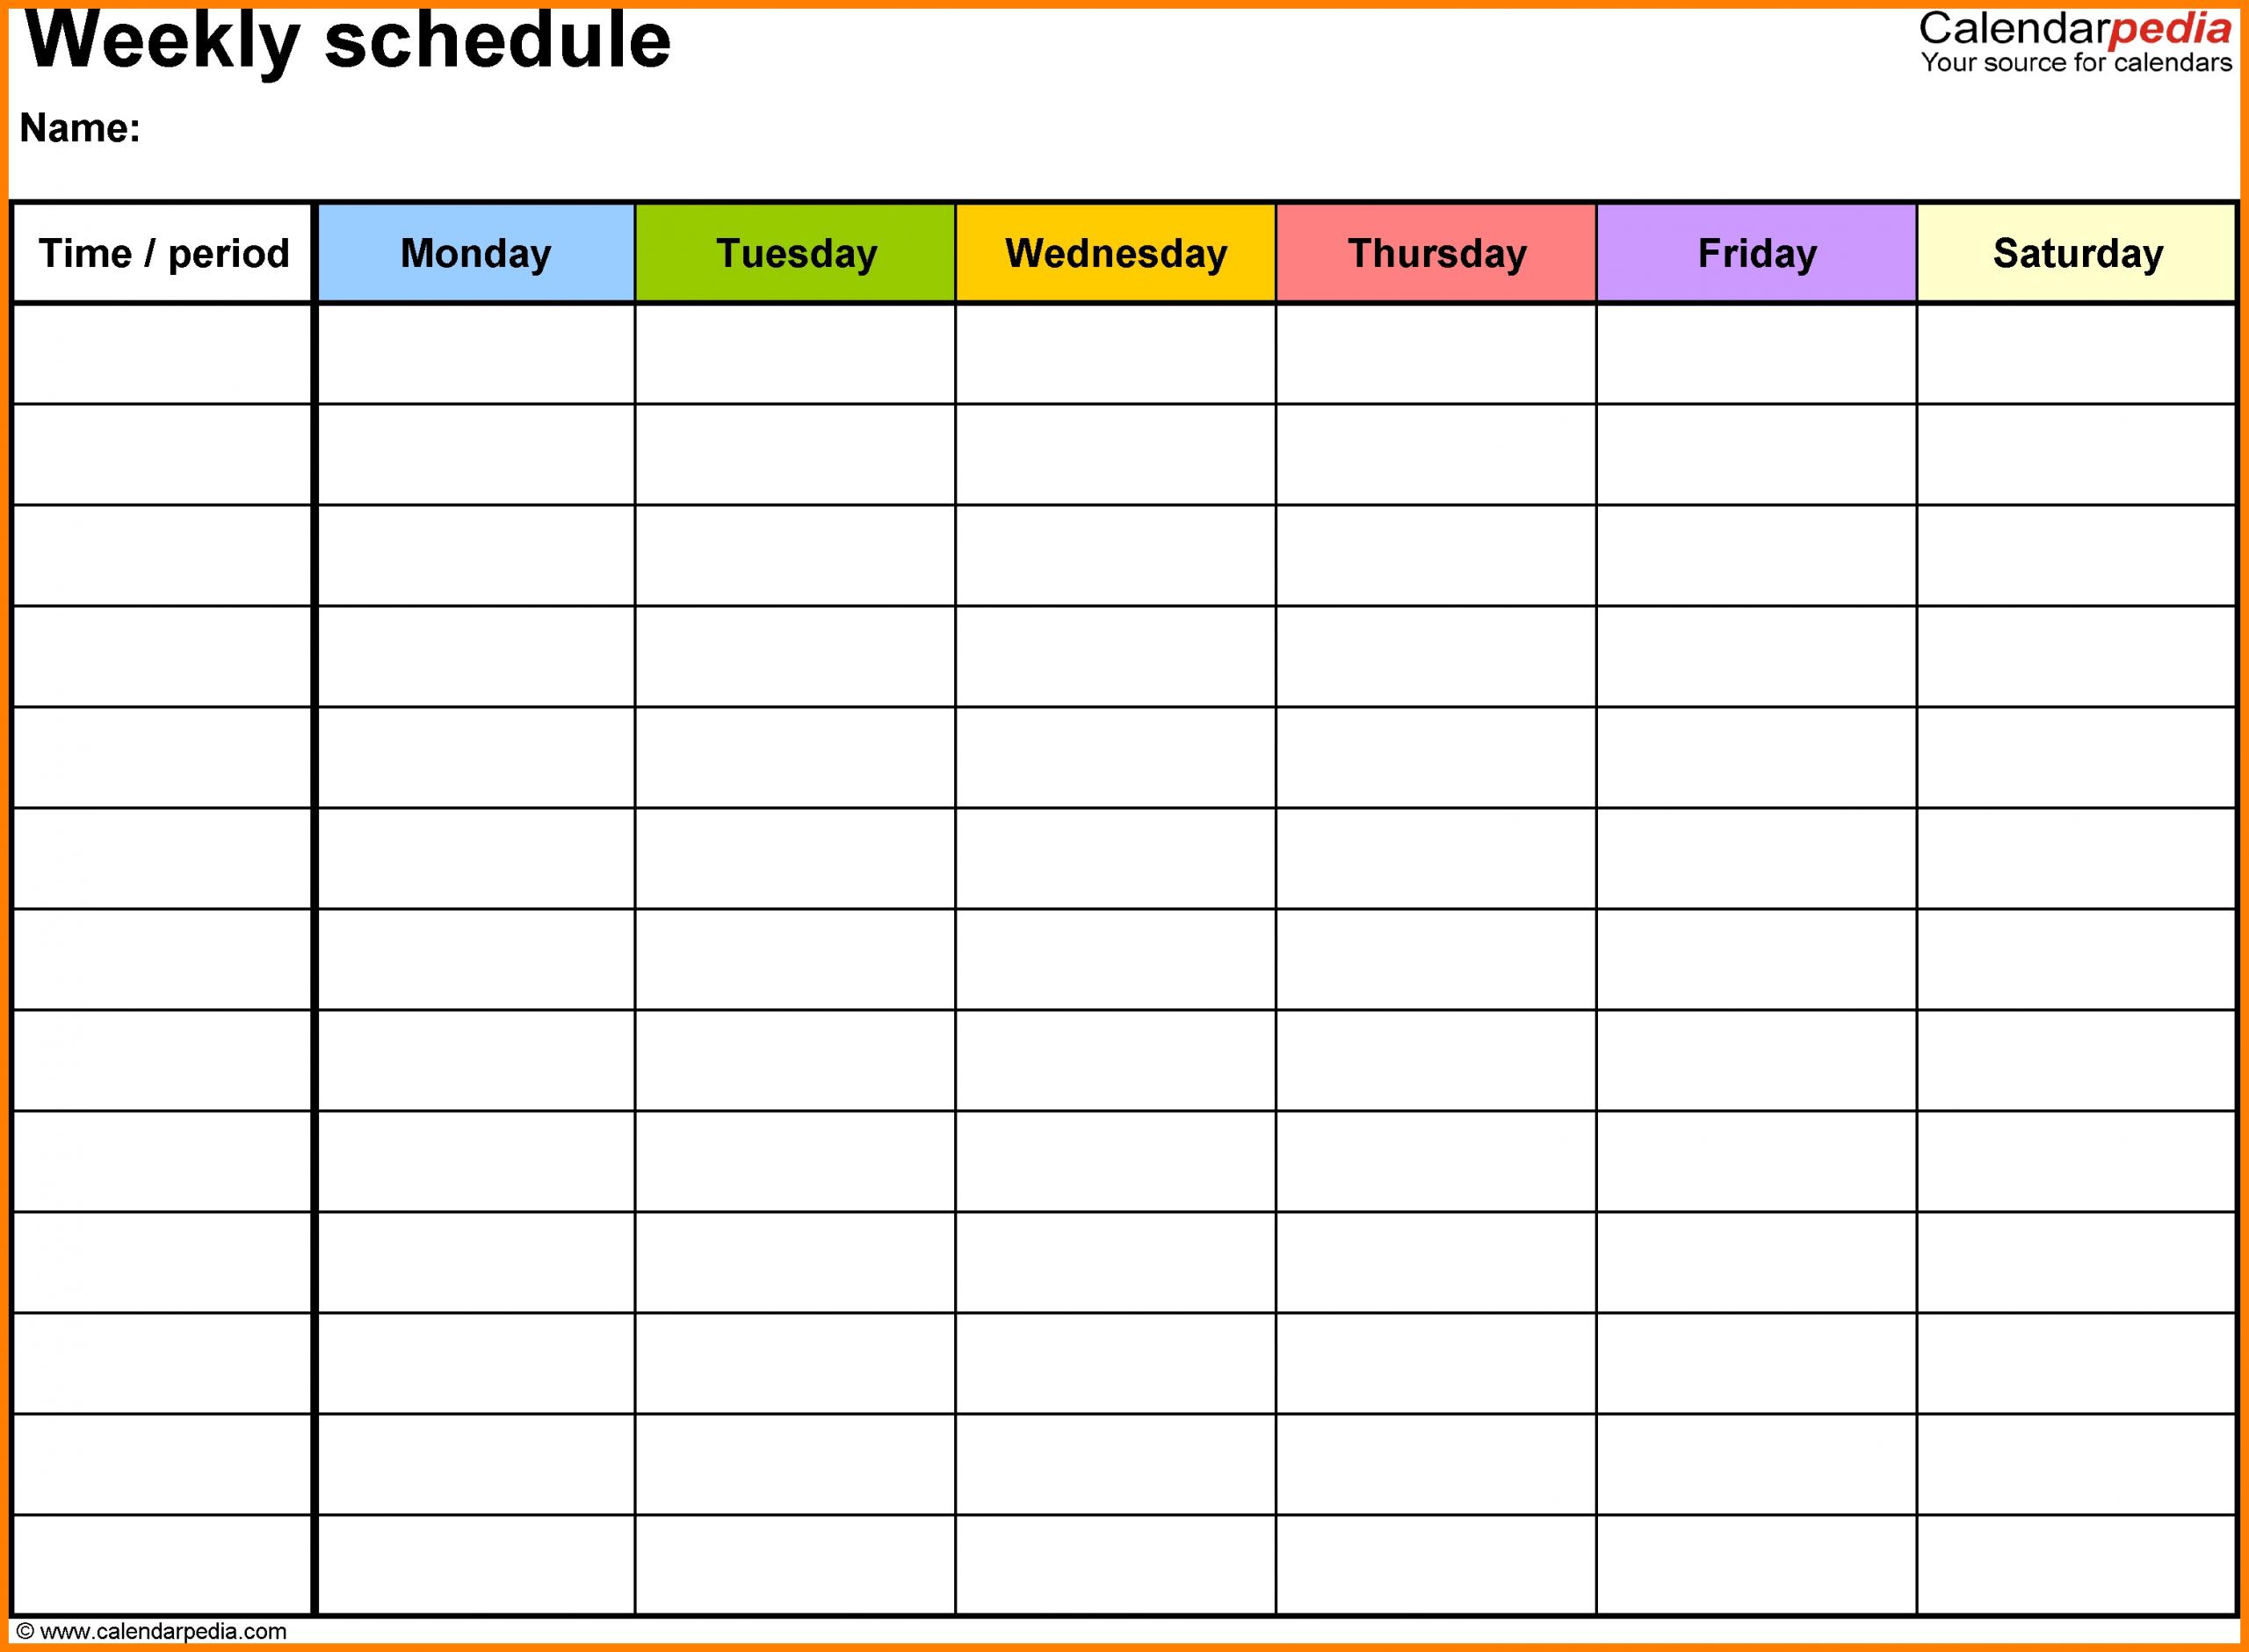 Printable Weekly Calendar With Time Slots - Calendar Interactive Calendar With Time Slots Free